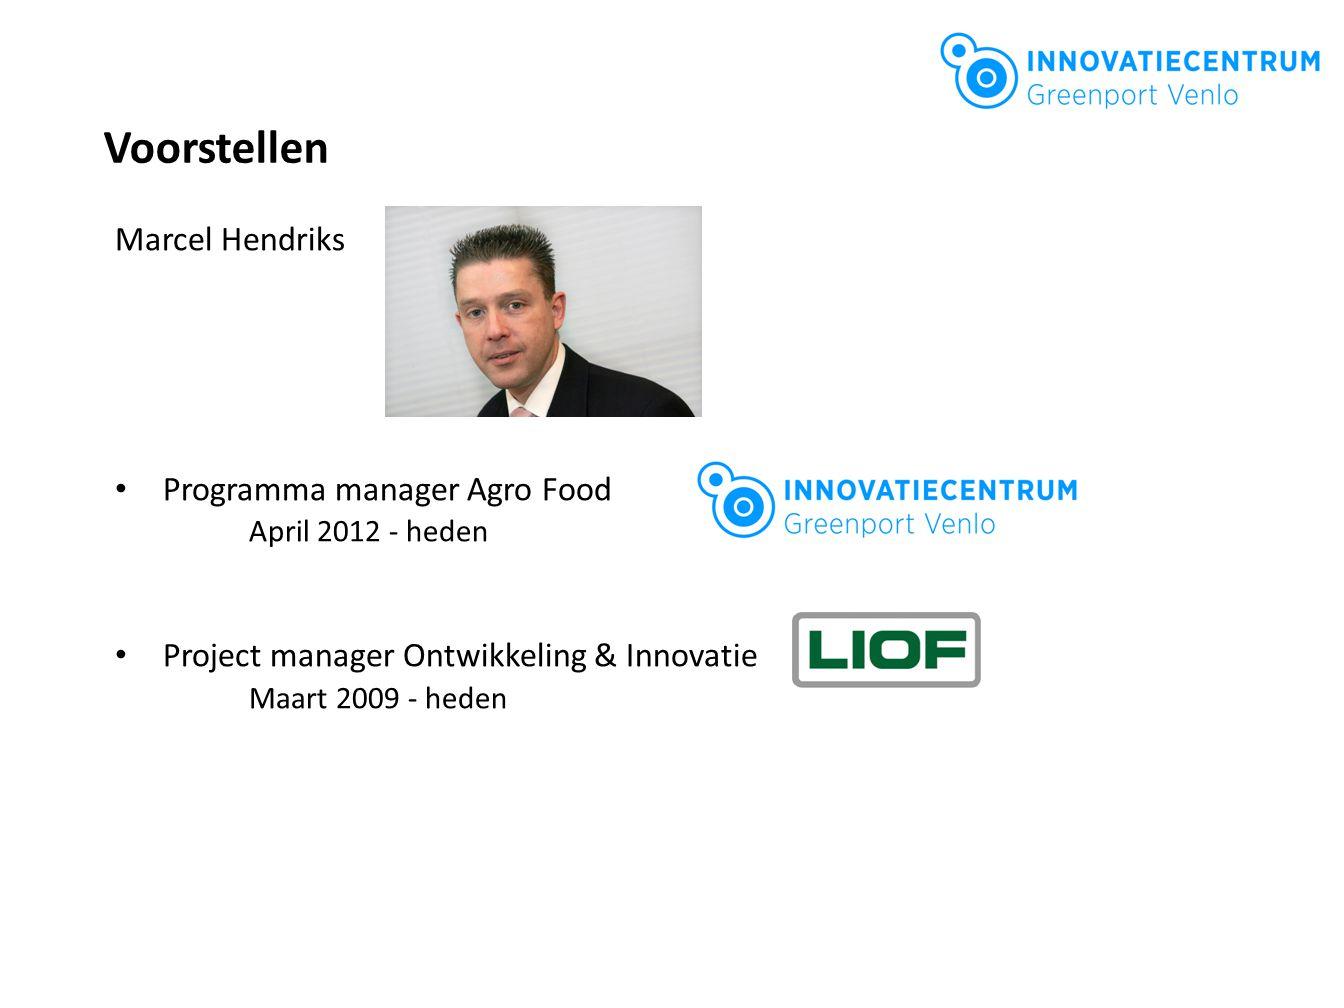 Voorstellen Marcel Hendriks Programma manager Agro Food